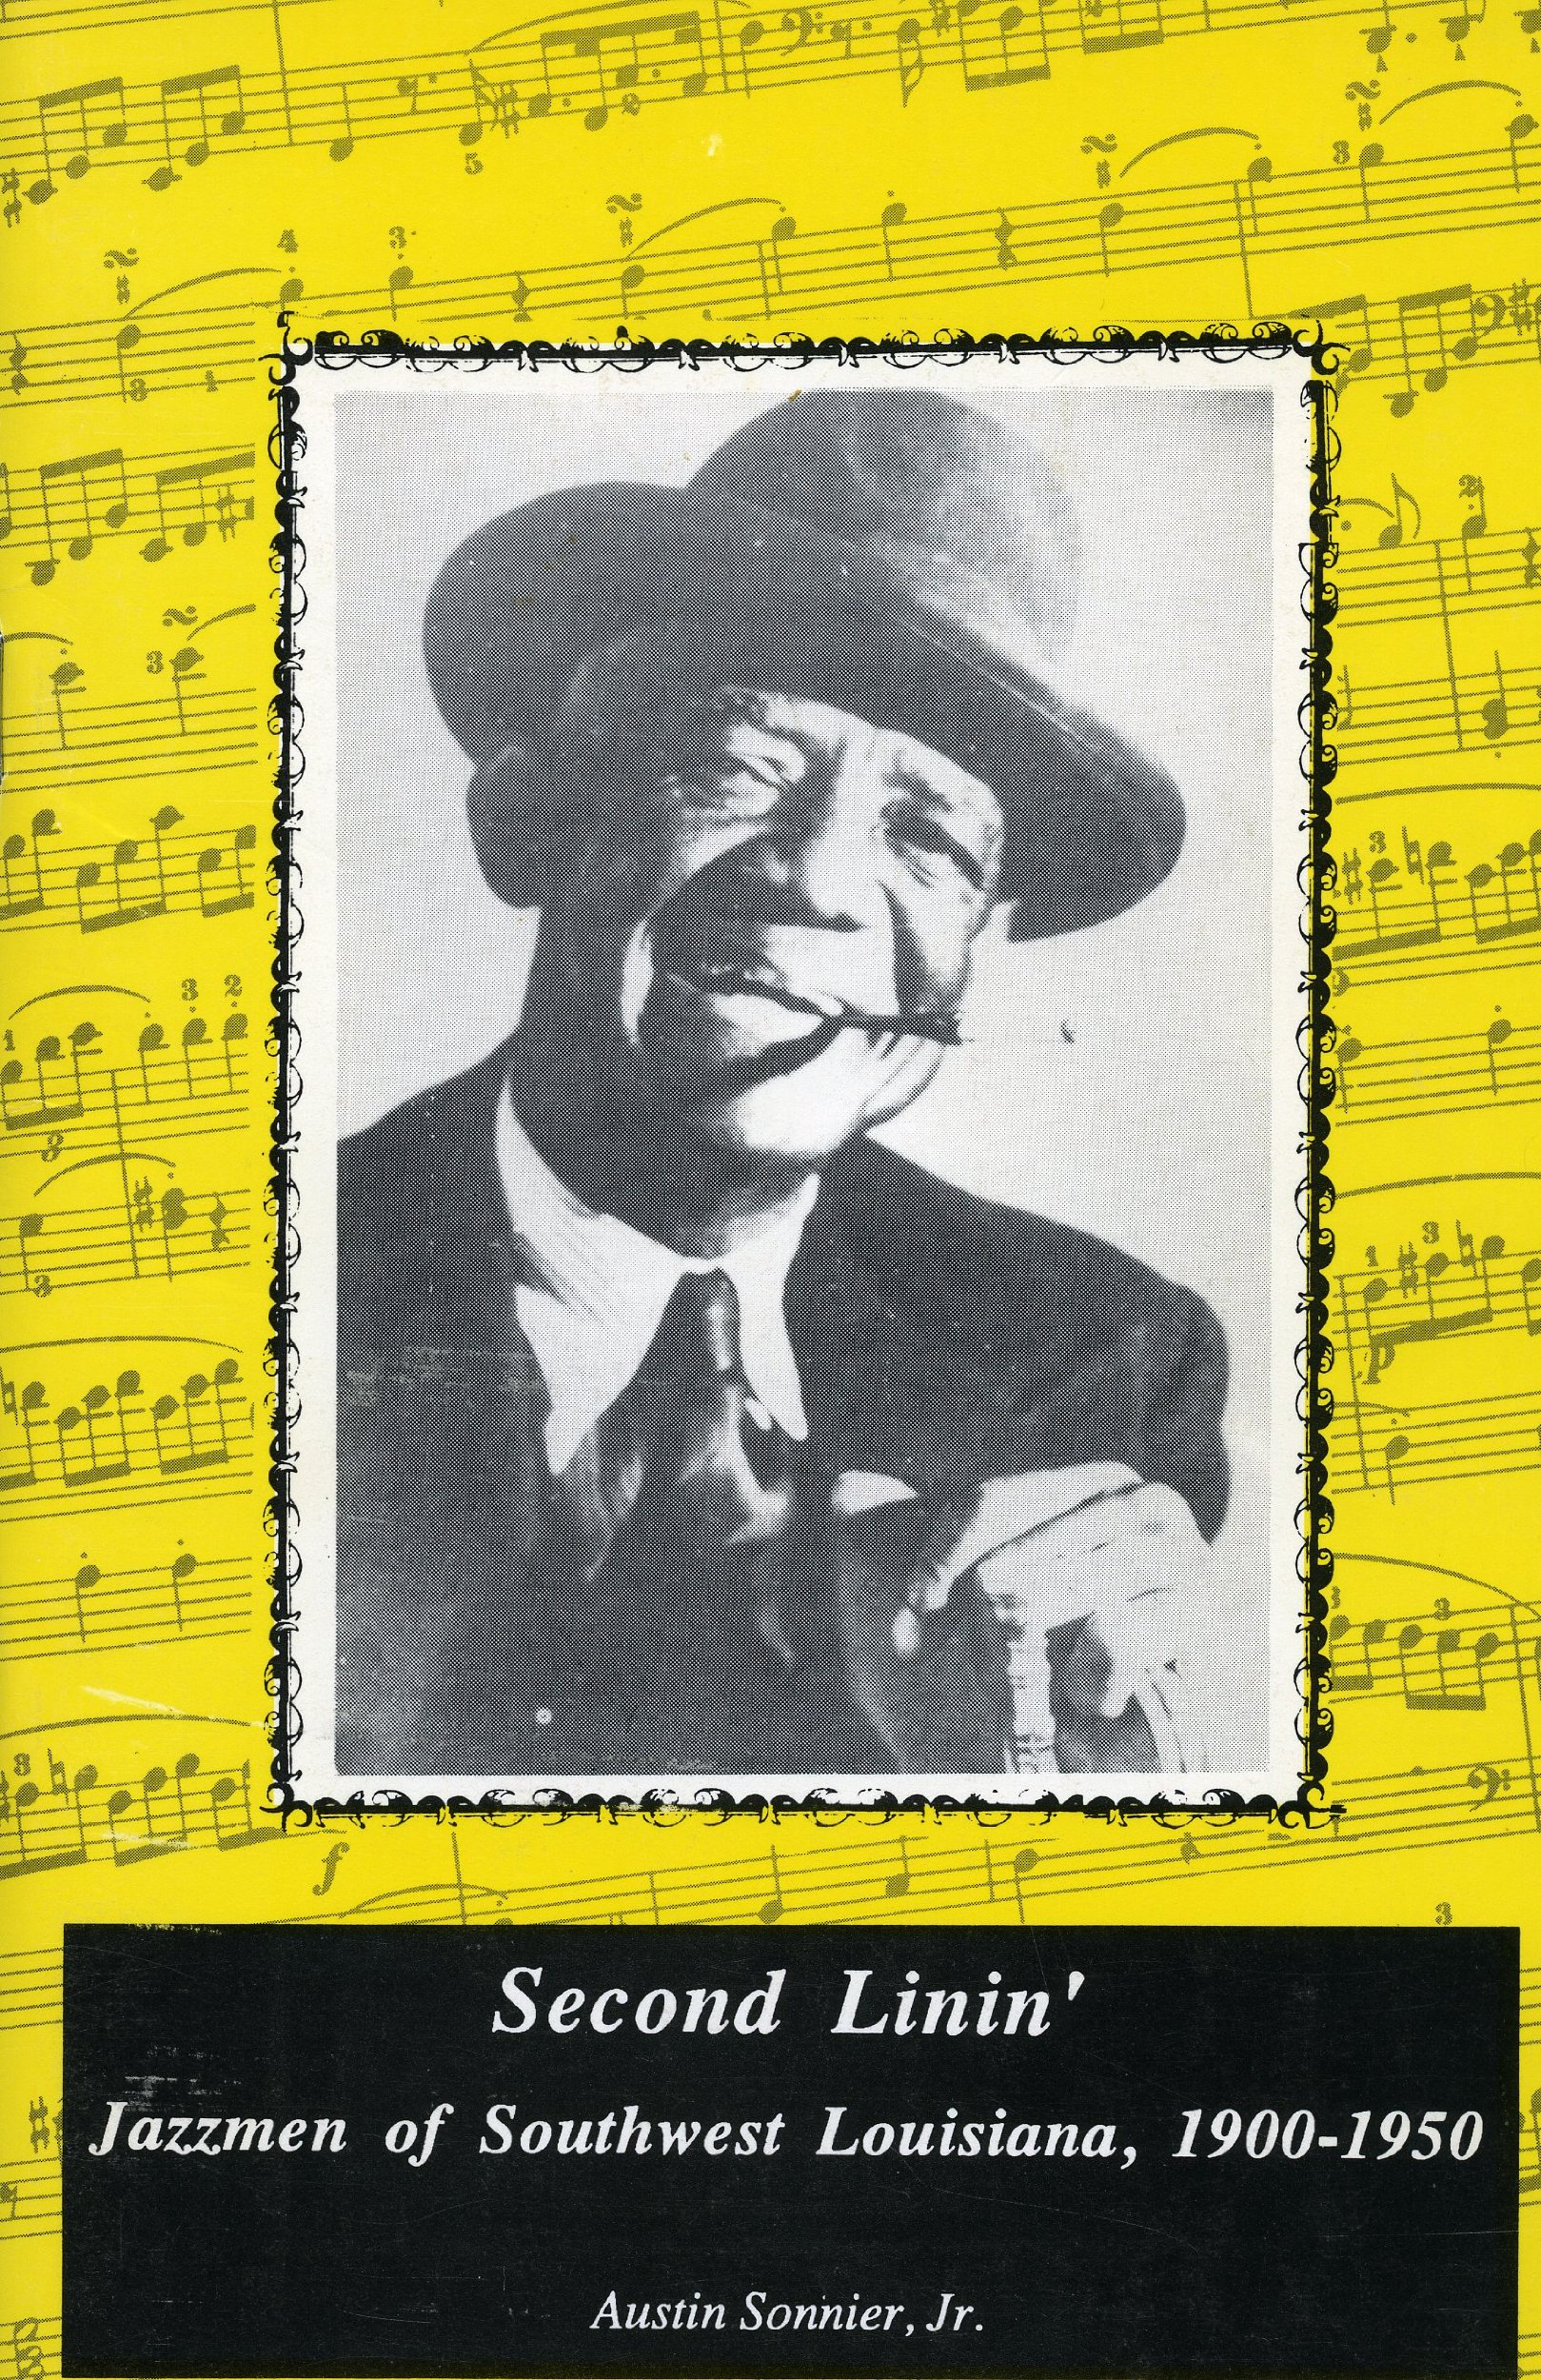 Second Linin: Jazzmen of Southwest Louisiana 1900-1950